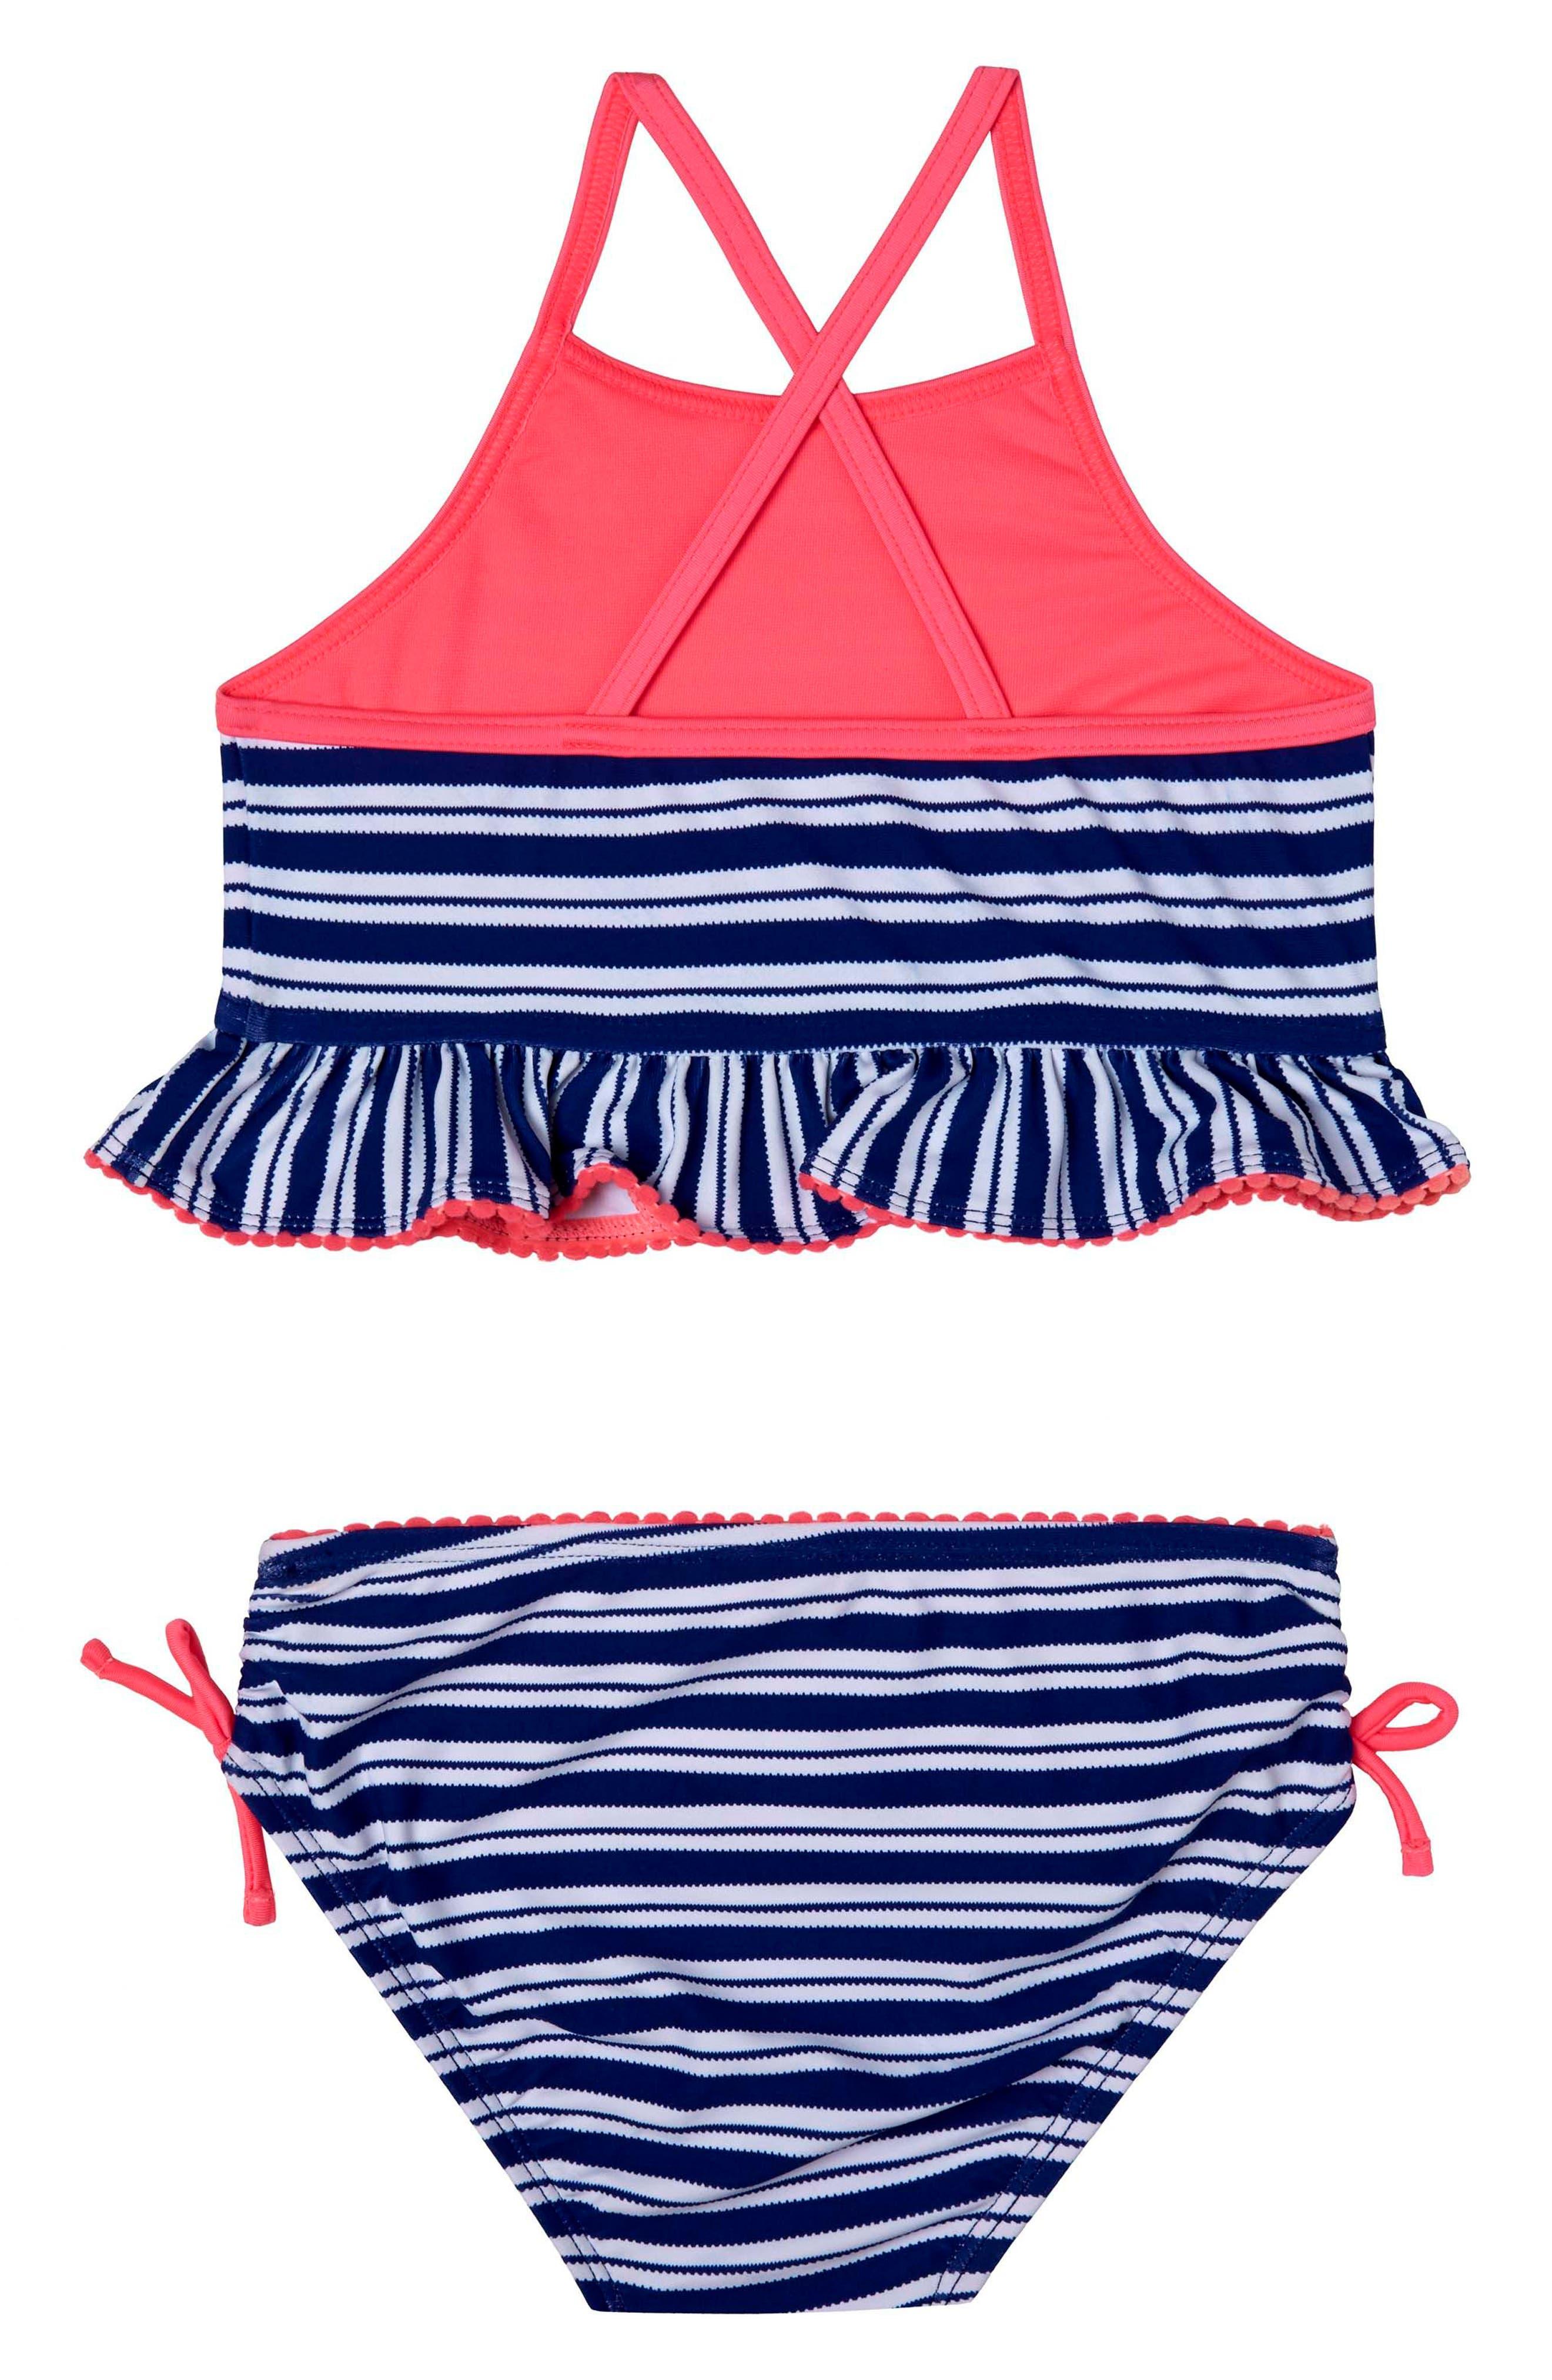 Retro StripeTwo-Piece Swimsuit,                             Main thumbnail 1, color,                             976